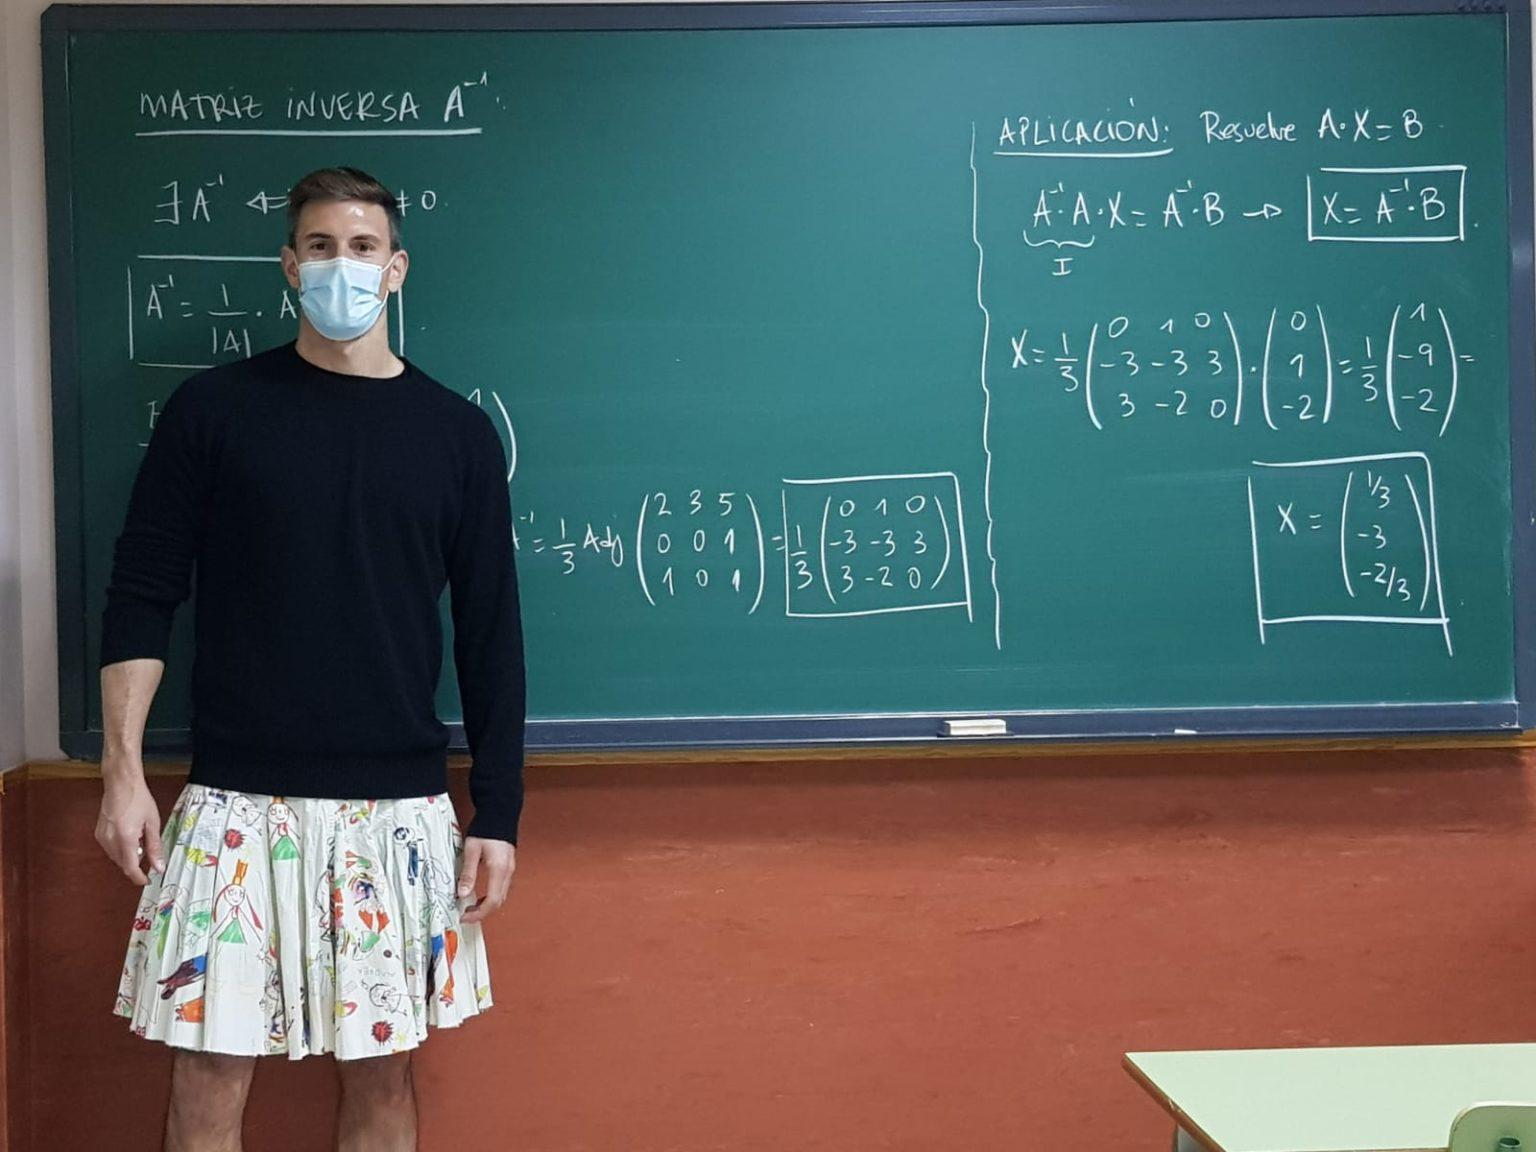 professores vestem saia para apoiar aluno